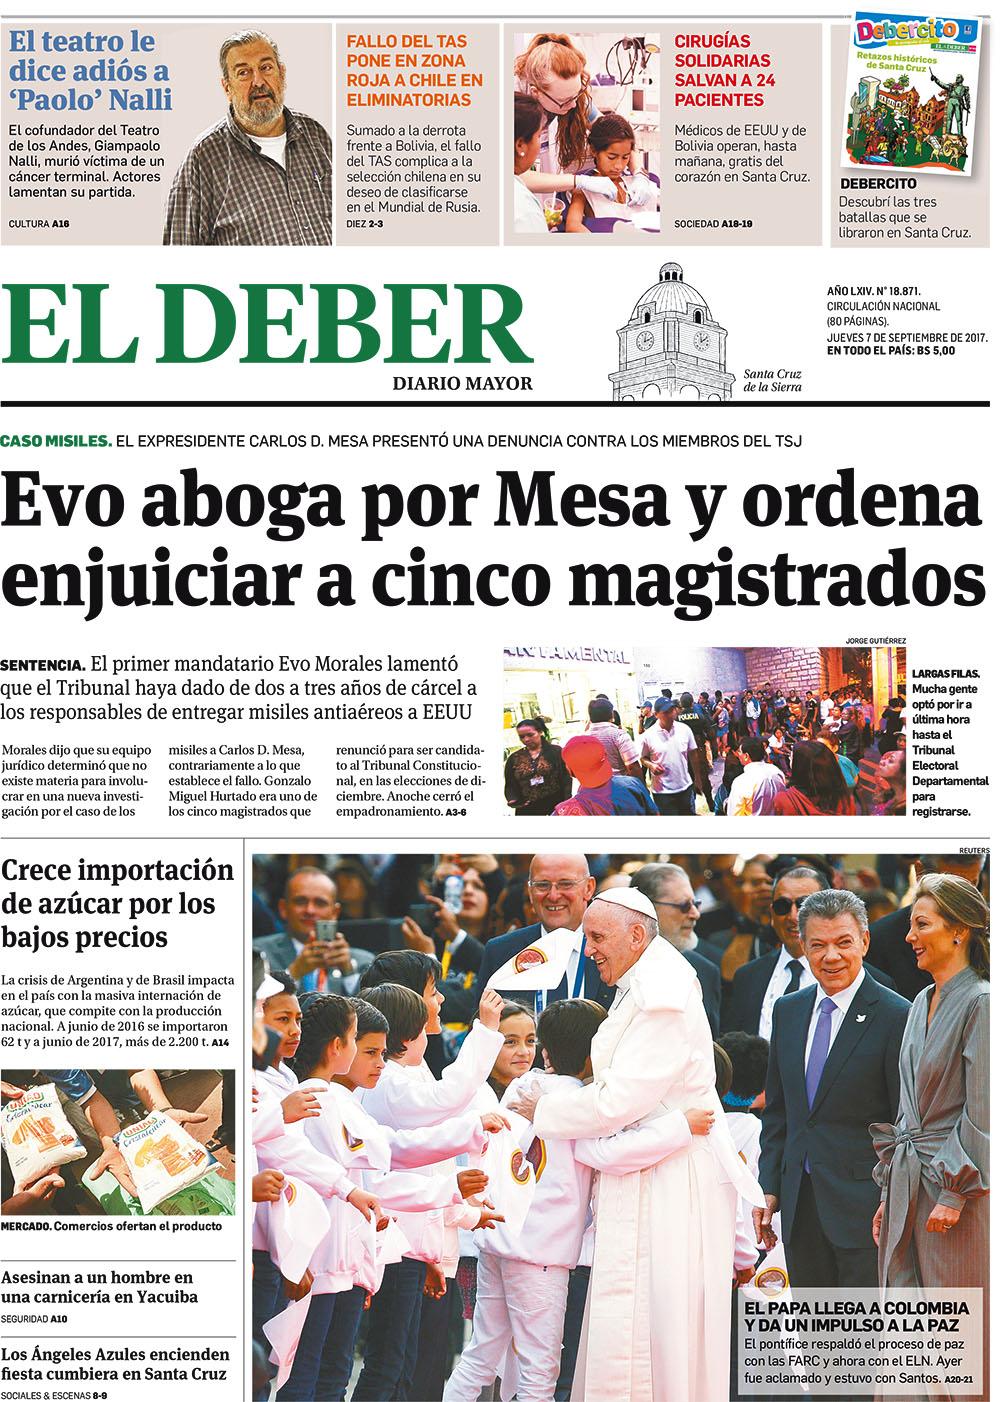 eldeber.com_.bo59b282c80c34b.jpg